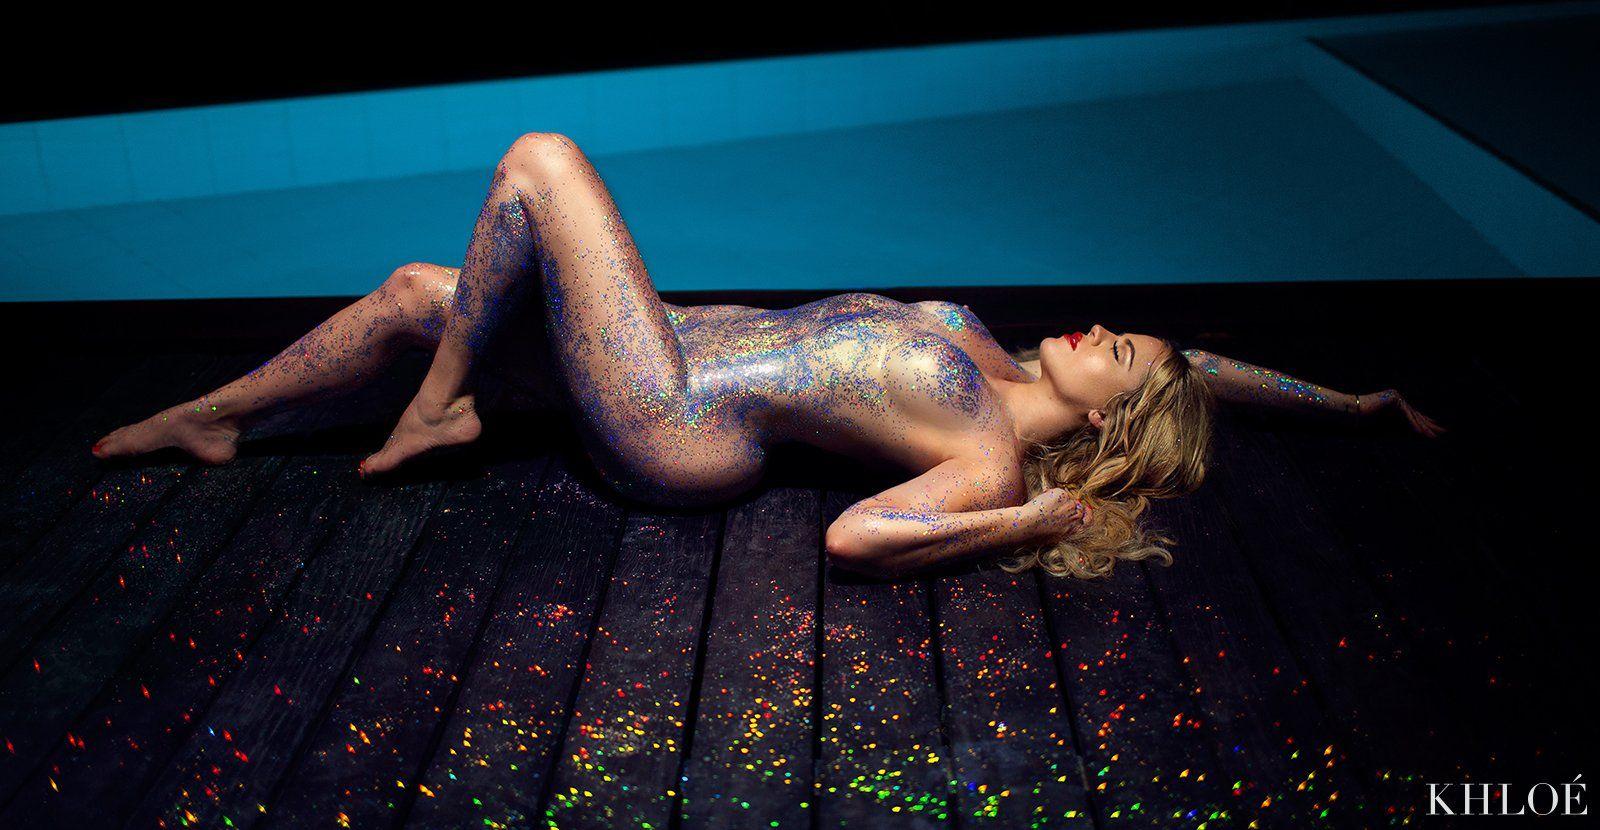 Khloe-Kardashian-Nude-Photos-1